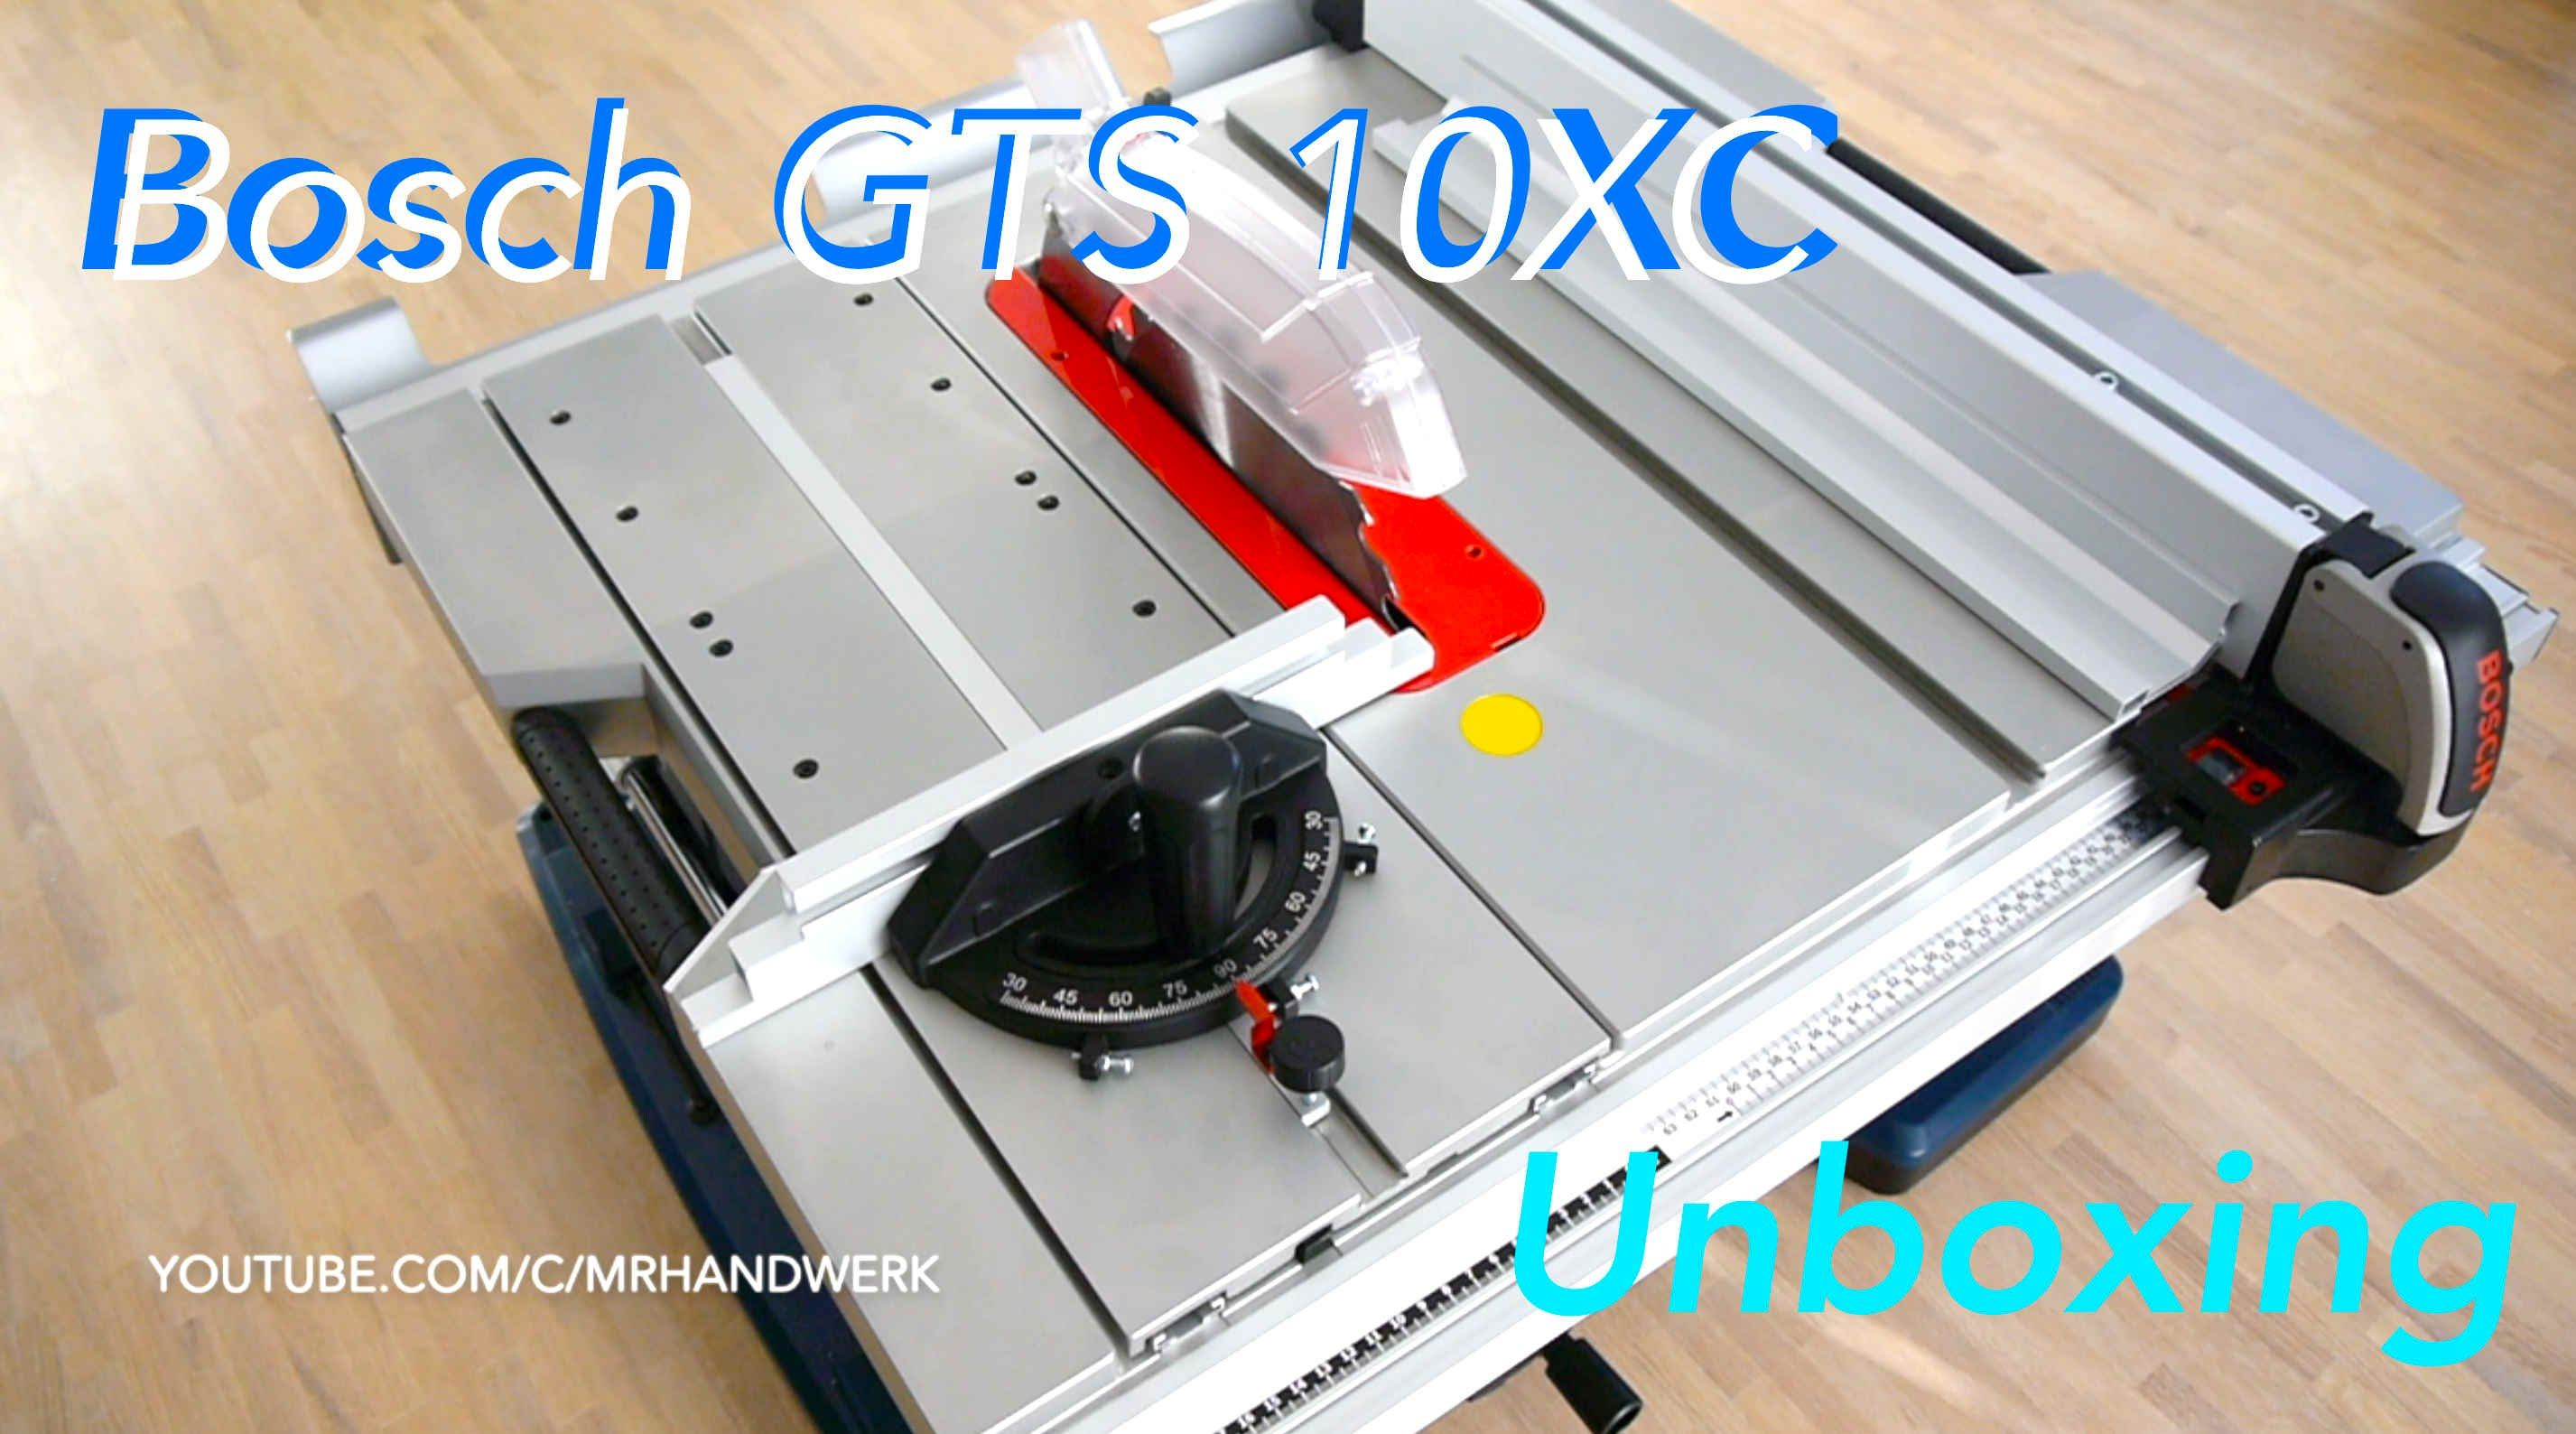 unboxing bosch gts 10 xc professional german / meine erste